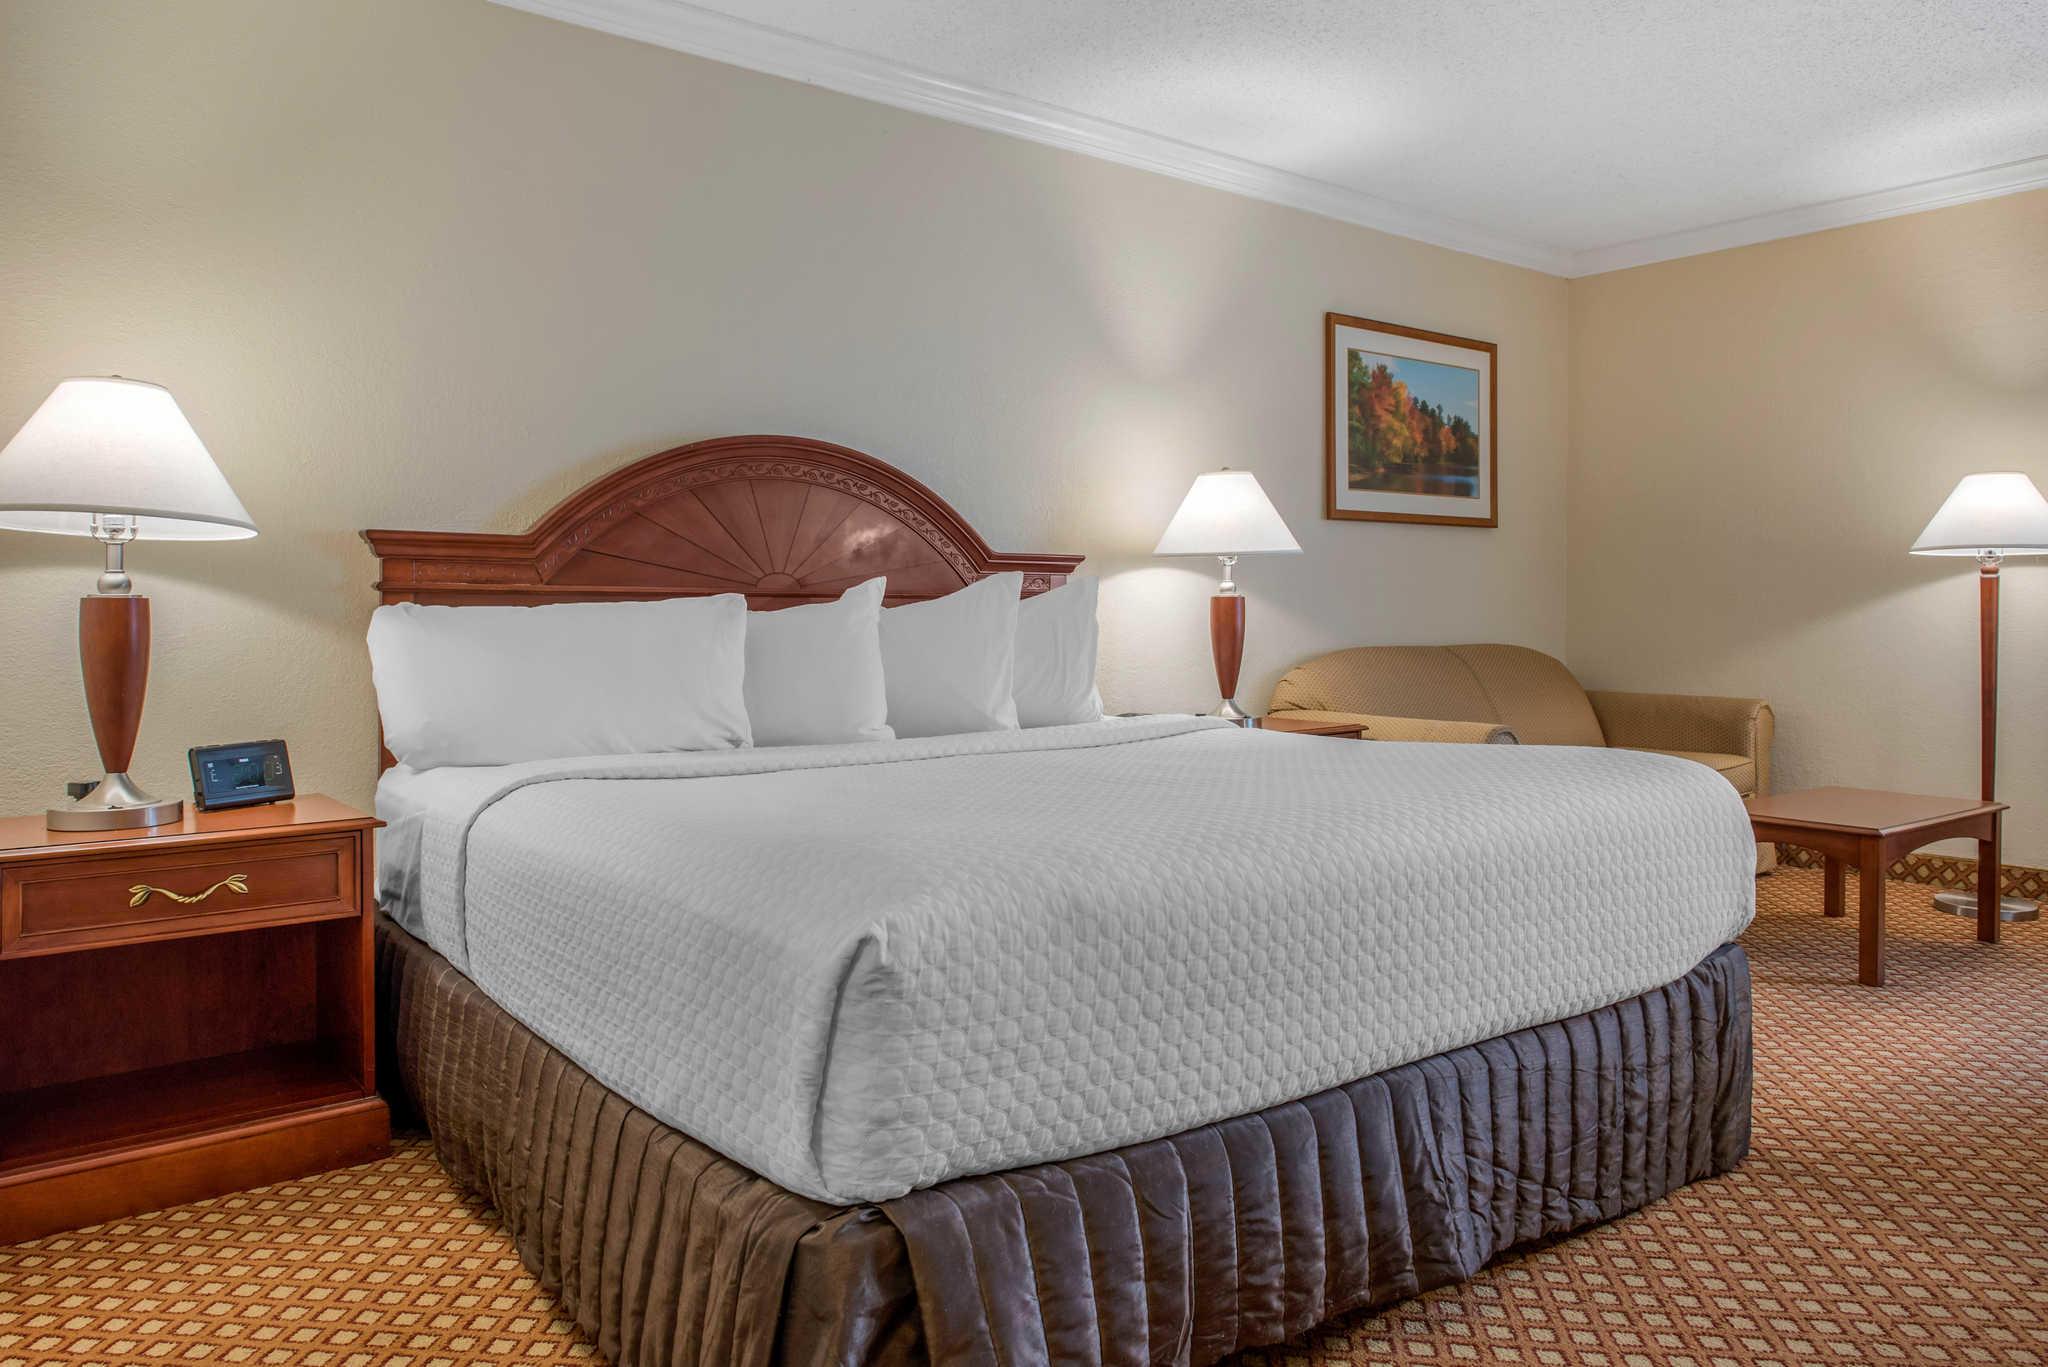 Quality Hotel - Cincinnati Blue Ash image 11